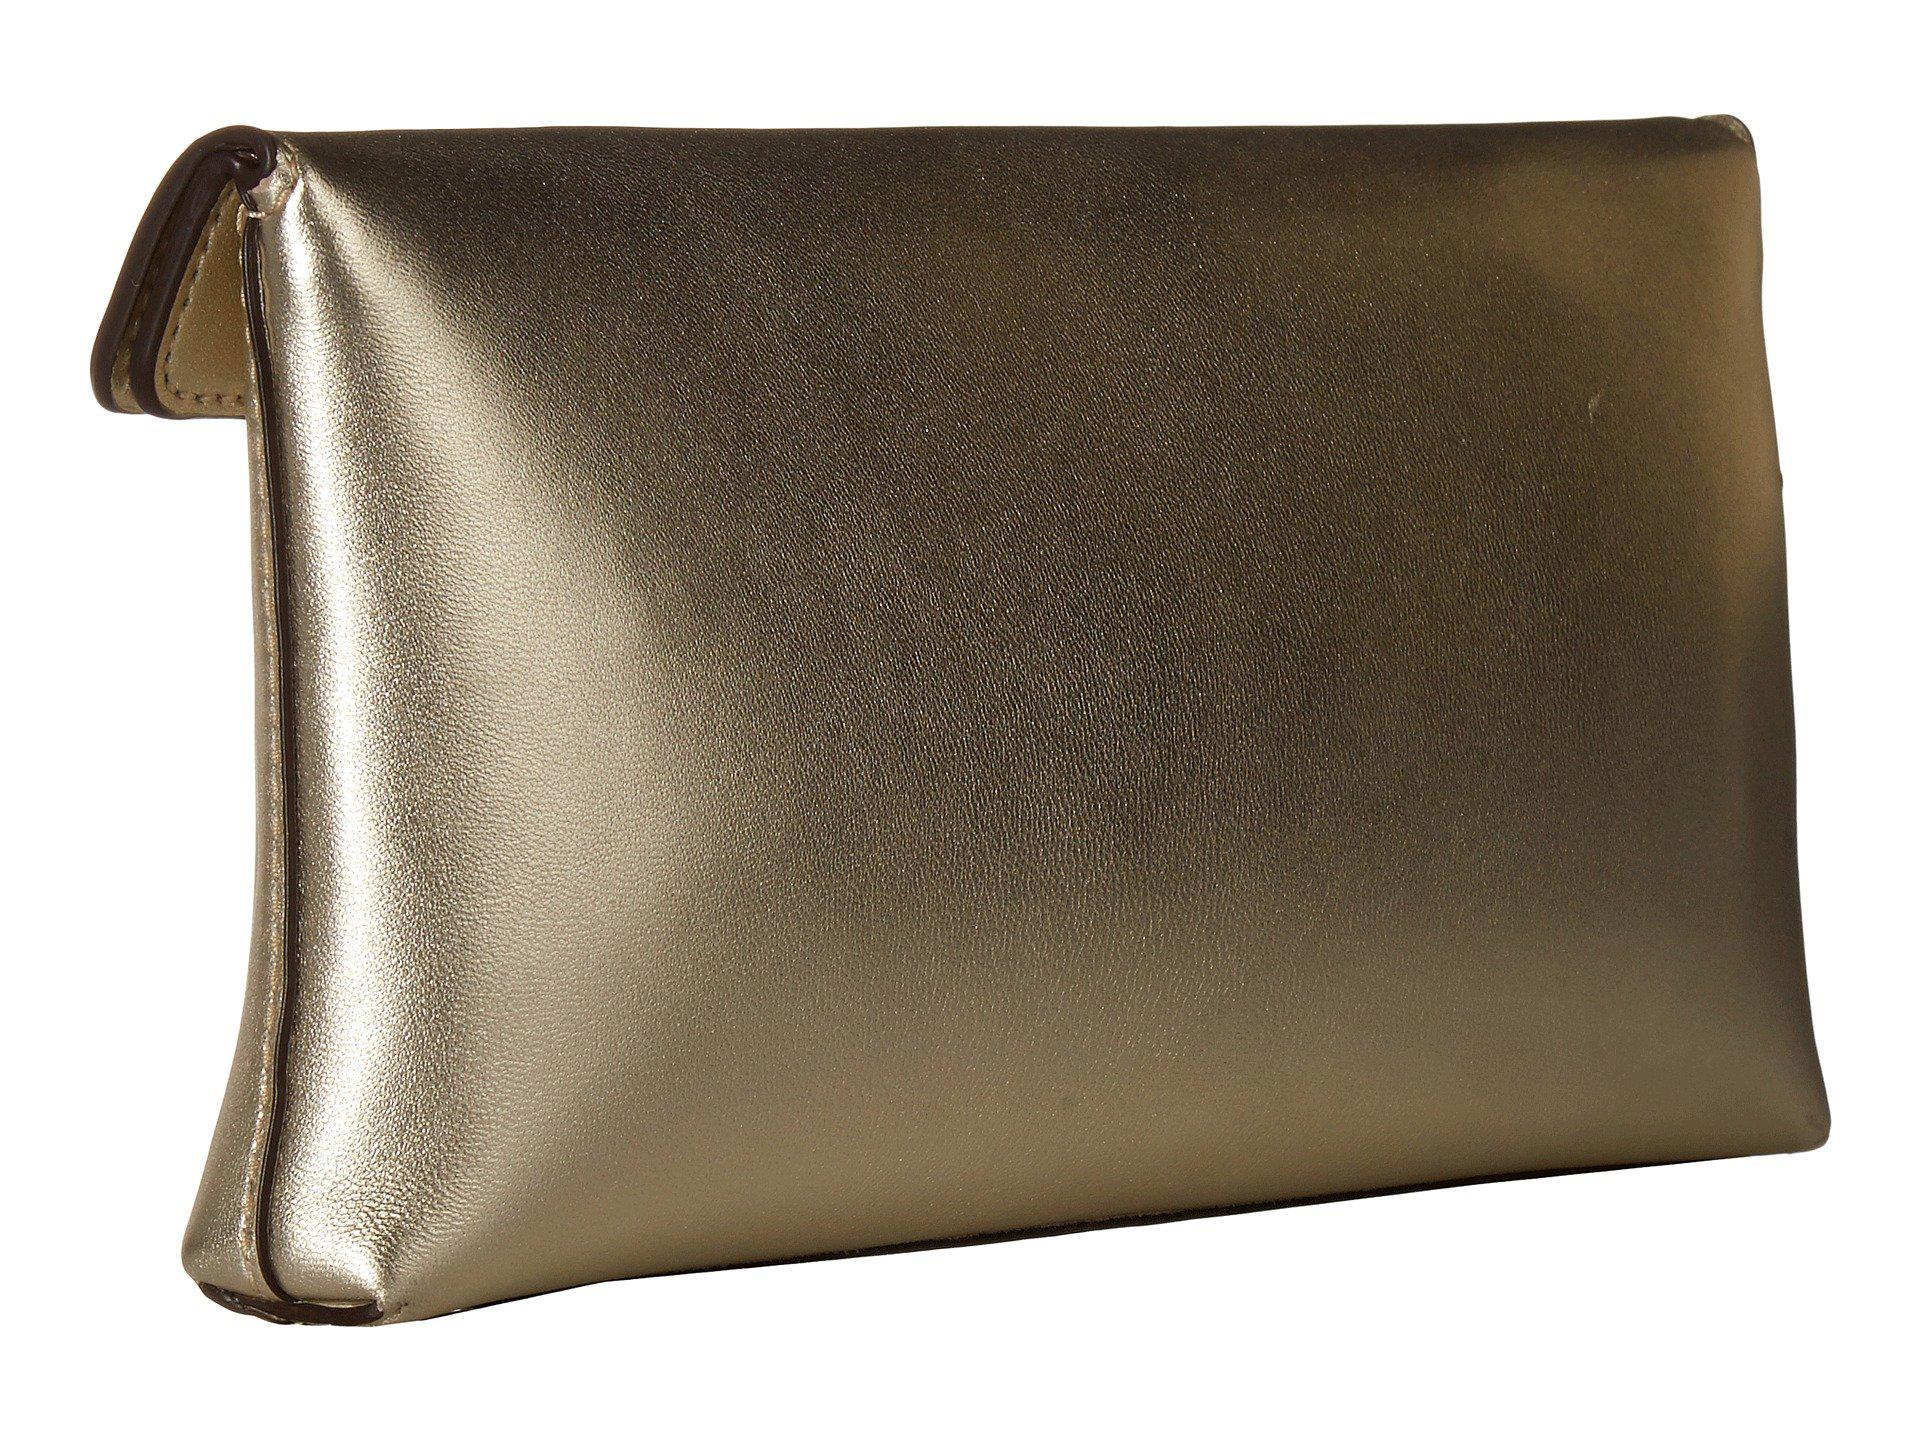 84e6f9cc5fbe Tory Burch - Miller Metallic Clutch (gold) Clutch Handbags - Lyst. View  fullscreen